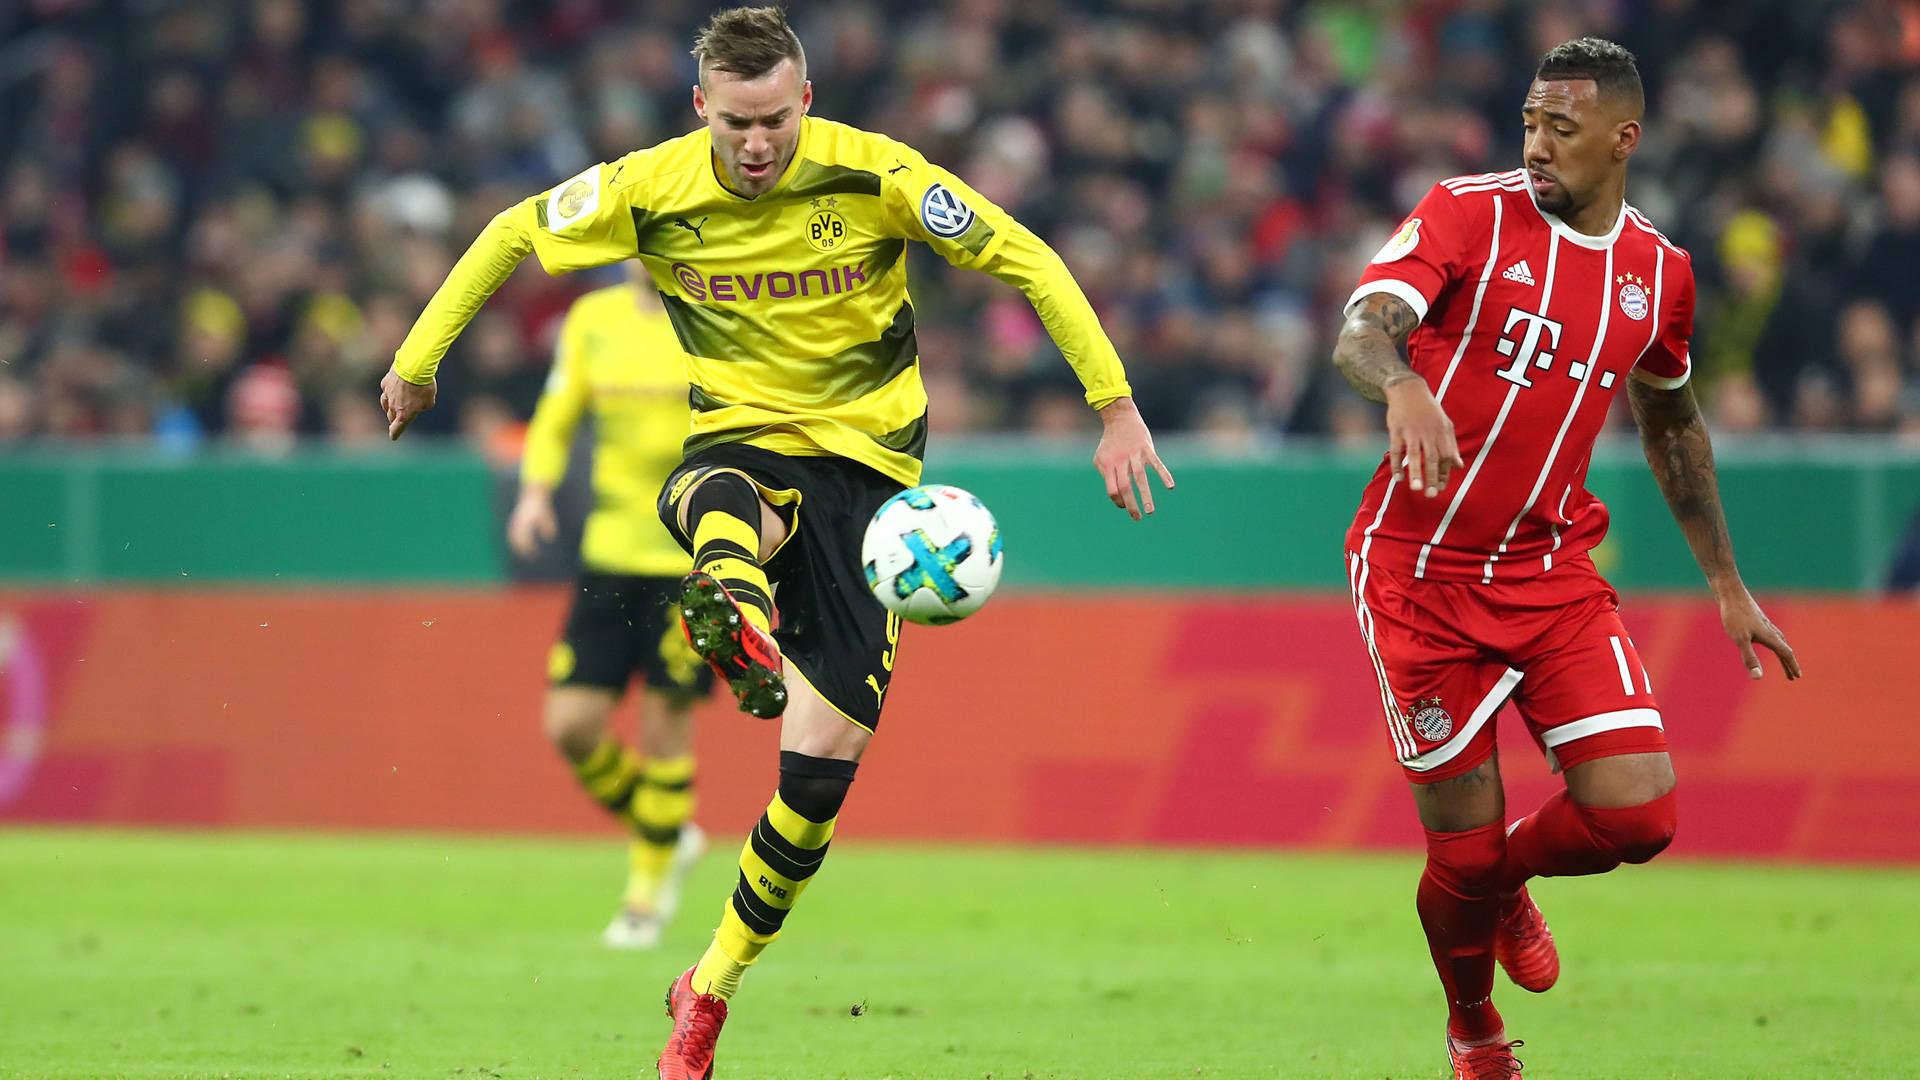 Andriy Yarmolenko Borussia Dortmund Jerome Boateng DFB Pokal 1217